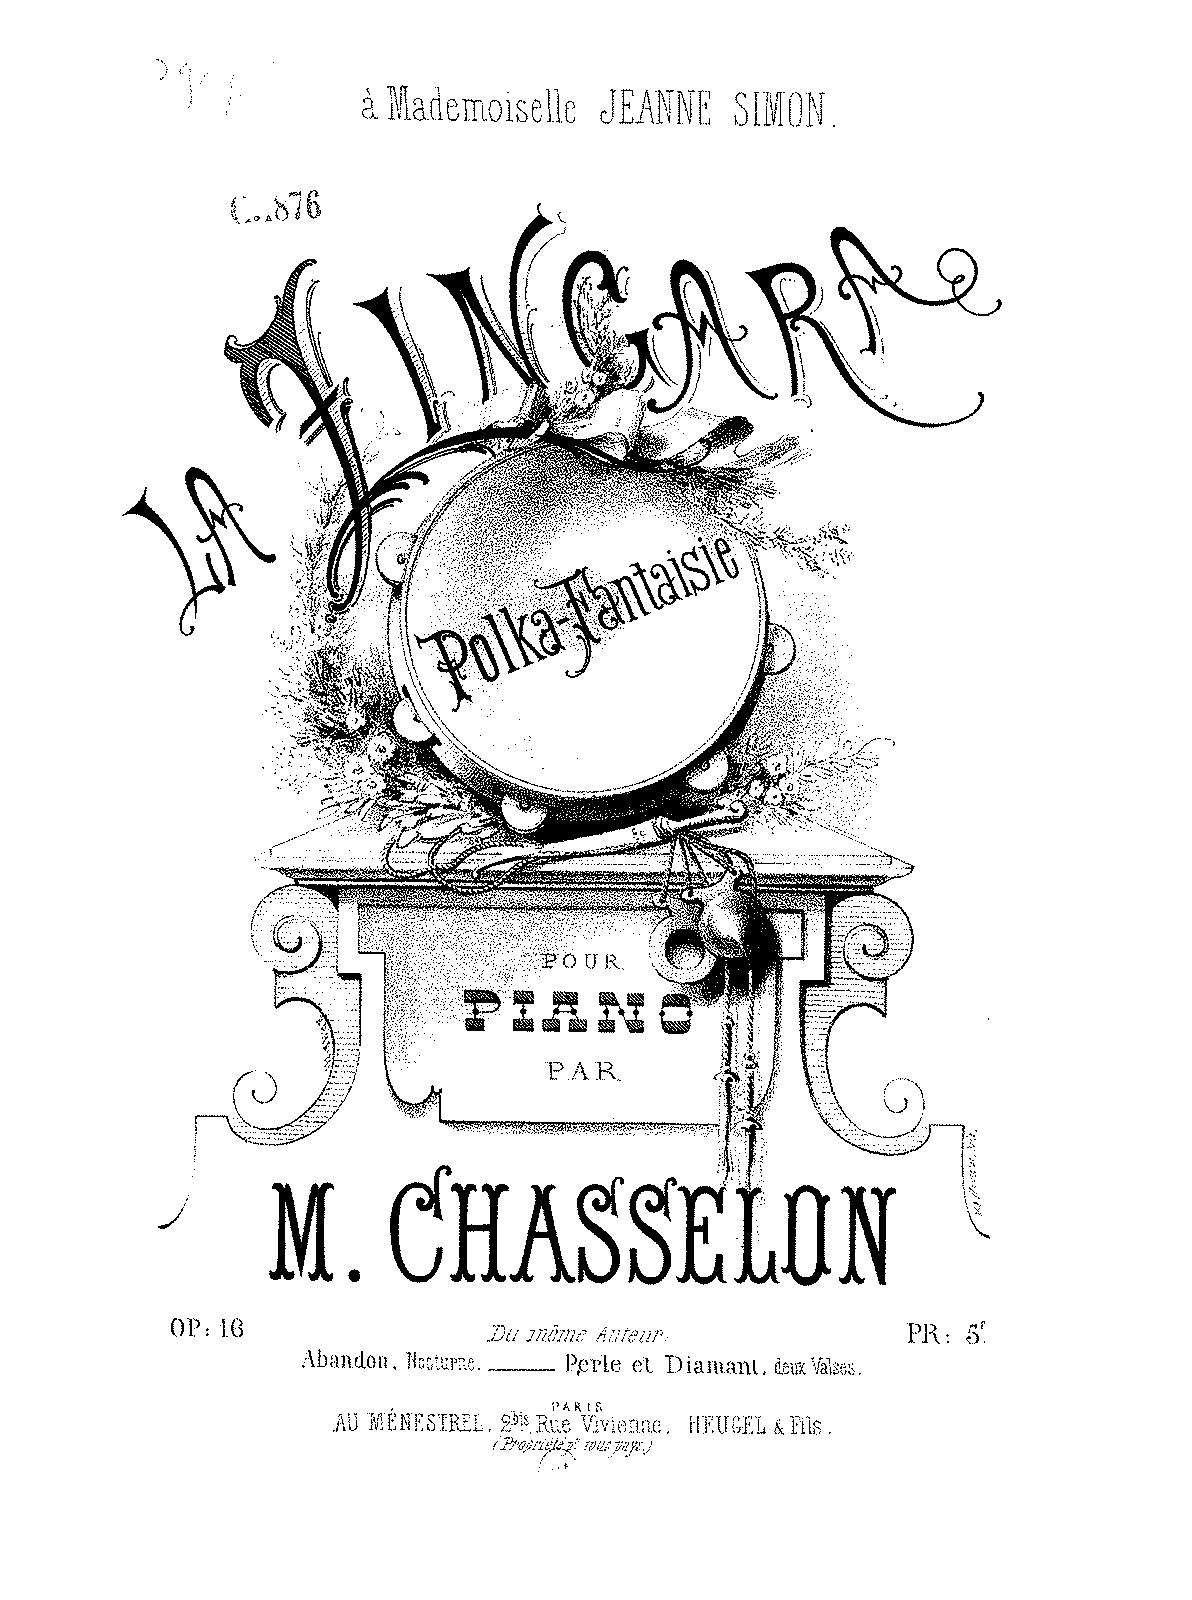 La Zingara, Op 16 (Chasselon, Mélanie) - IMSLP/Petrucci Music